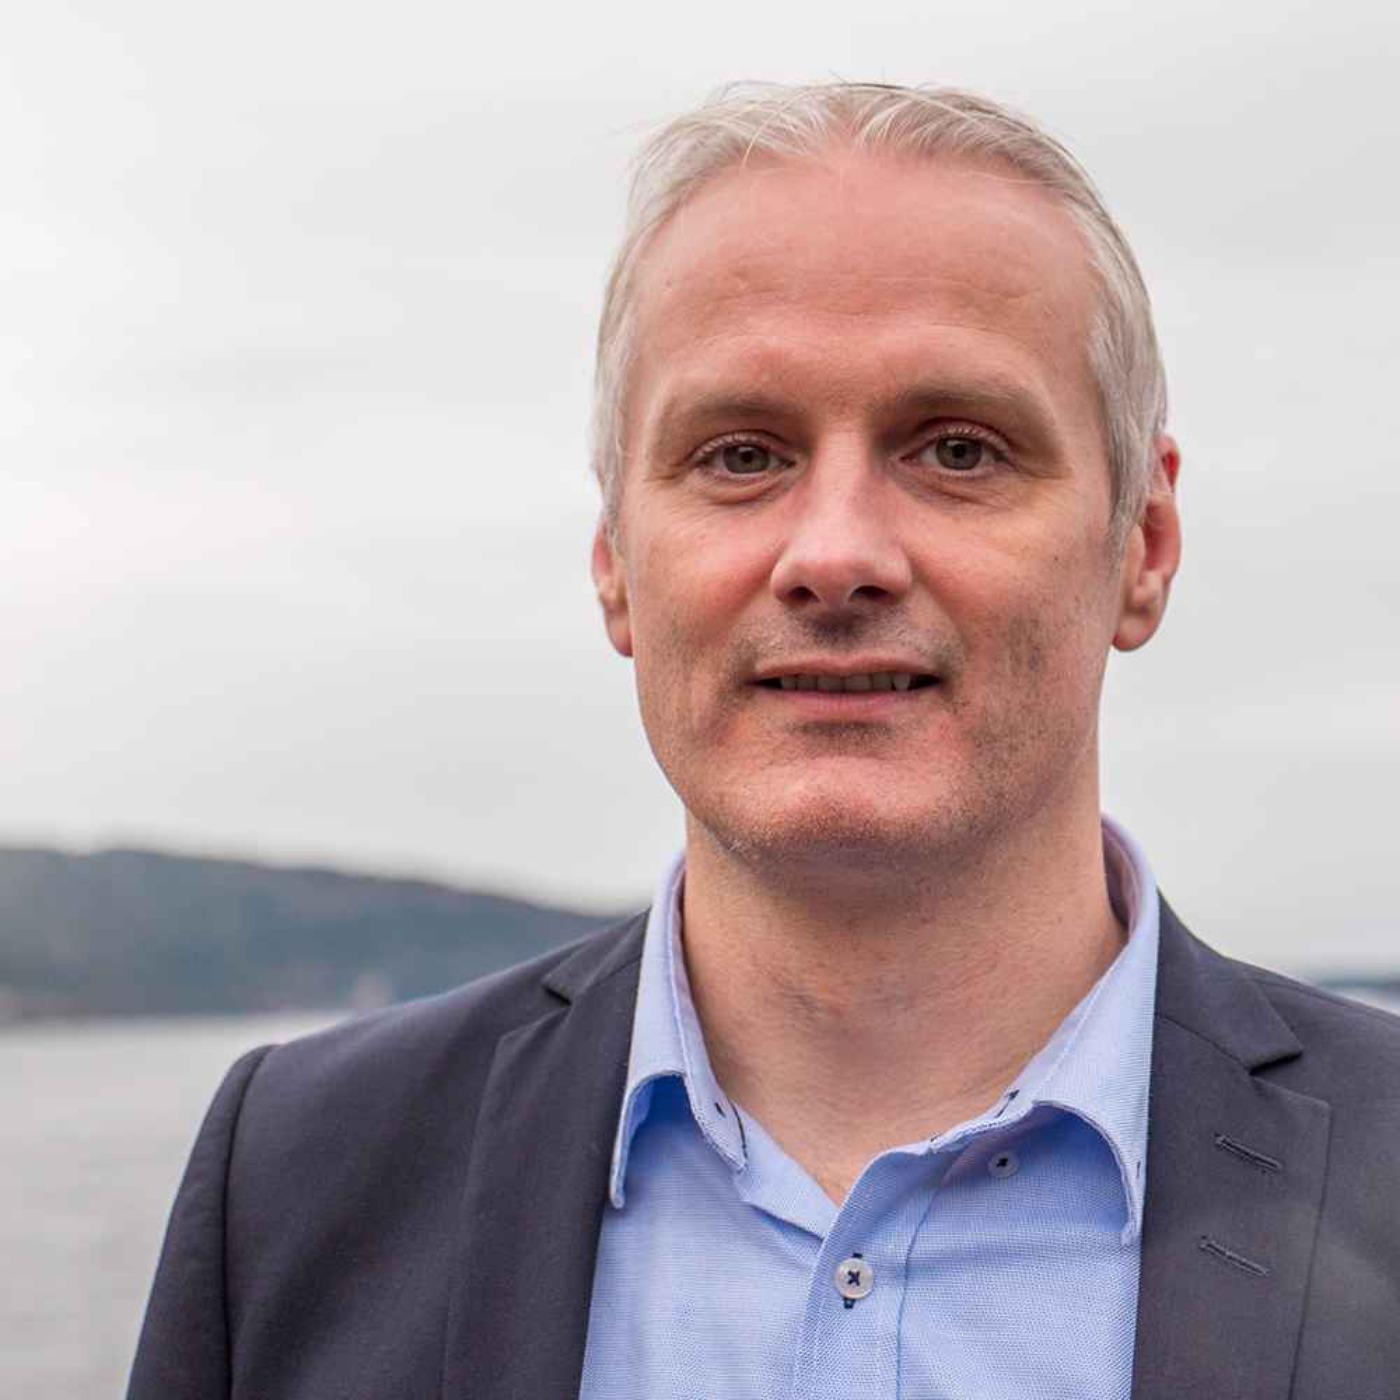 Han har doktorgrad i Finans og er professor på NHH - nå er Jan-Magnus Moberg ny partner i PwC